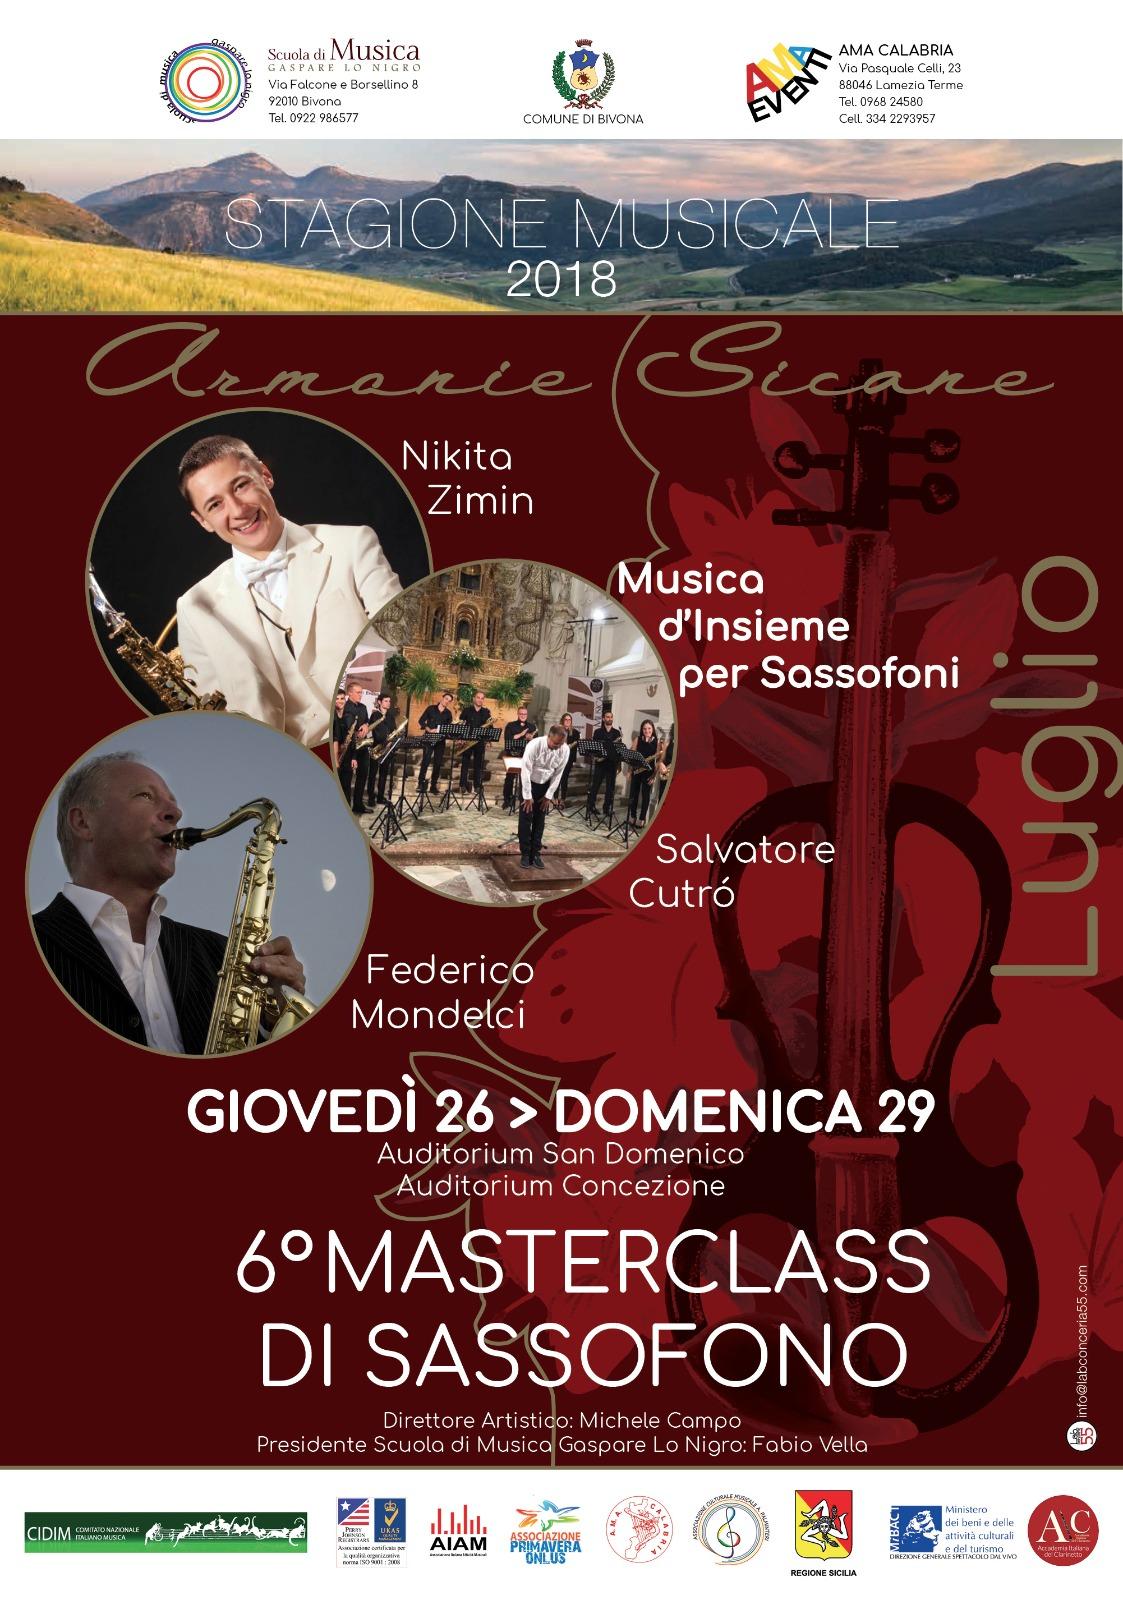 11 Masterclass Sassofono